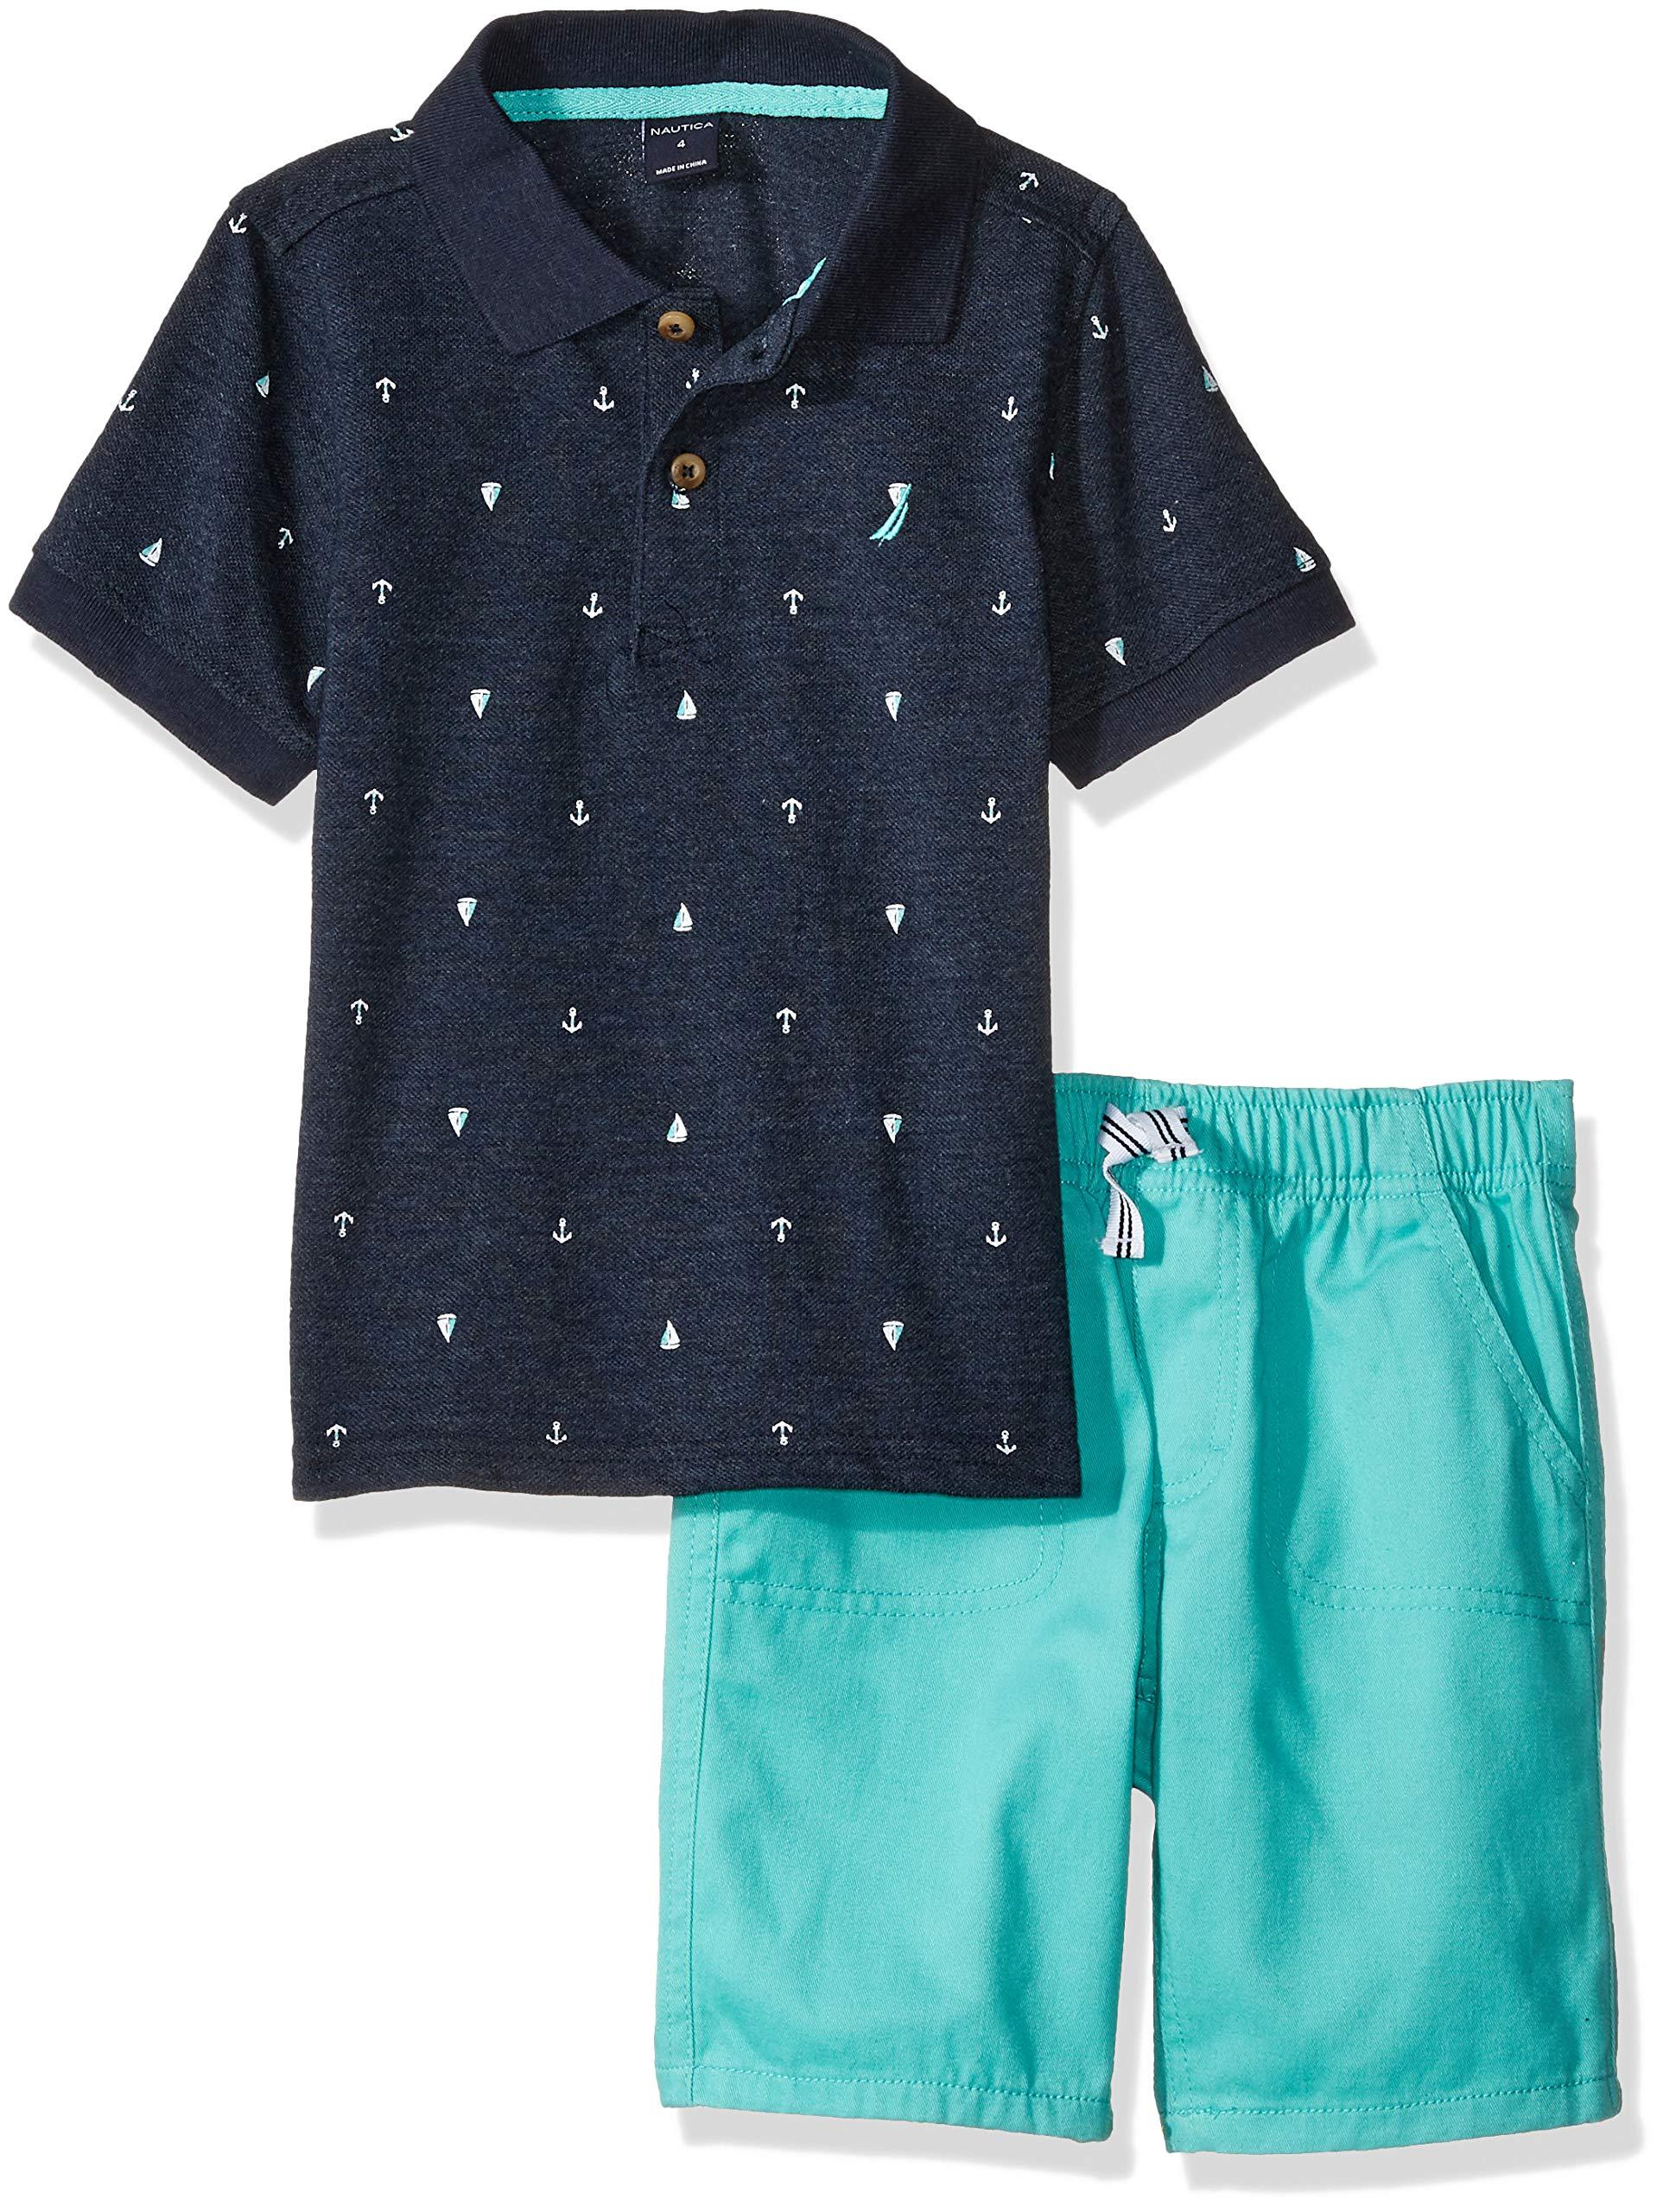 Nautica Sets (KHQ) Boys' Little 2 Pieces Polo Shorts Set, Blue/Green, 6